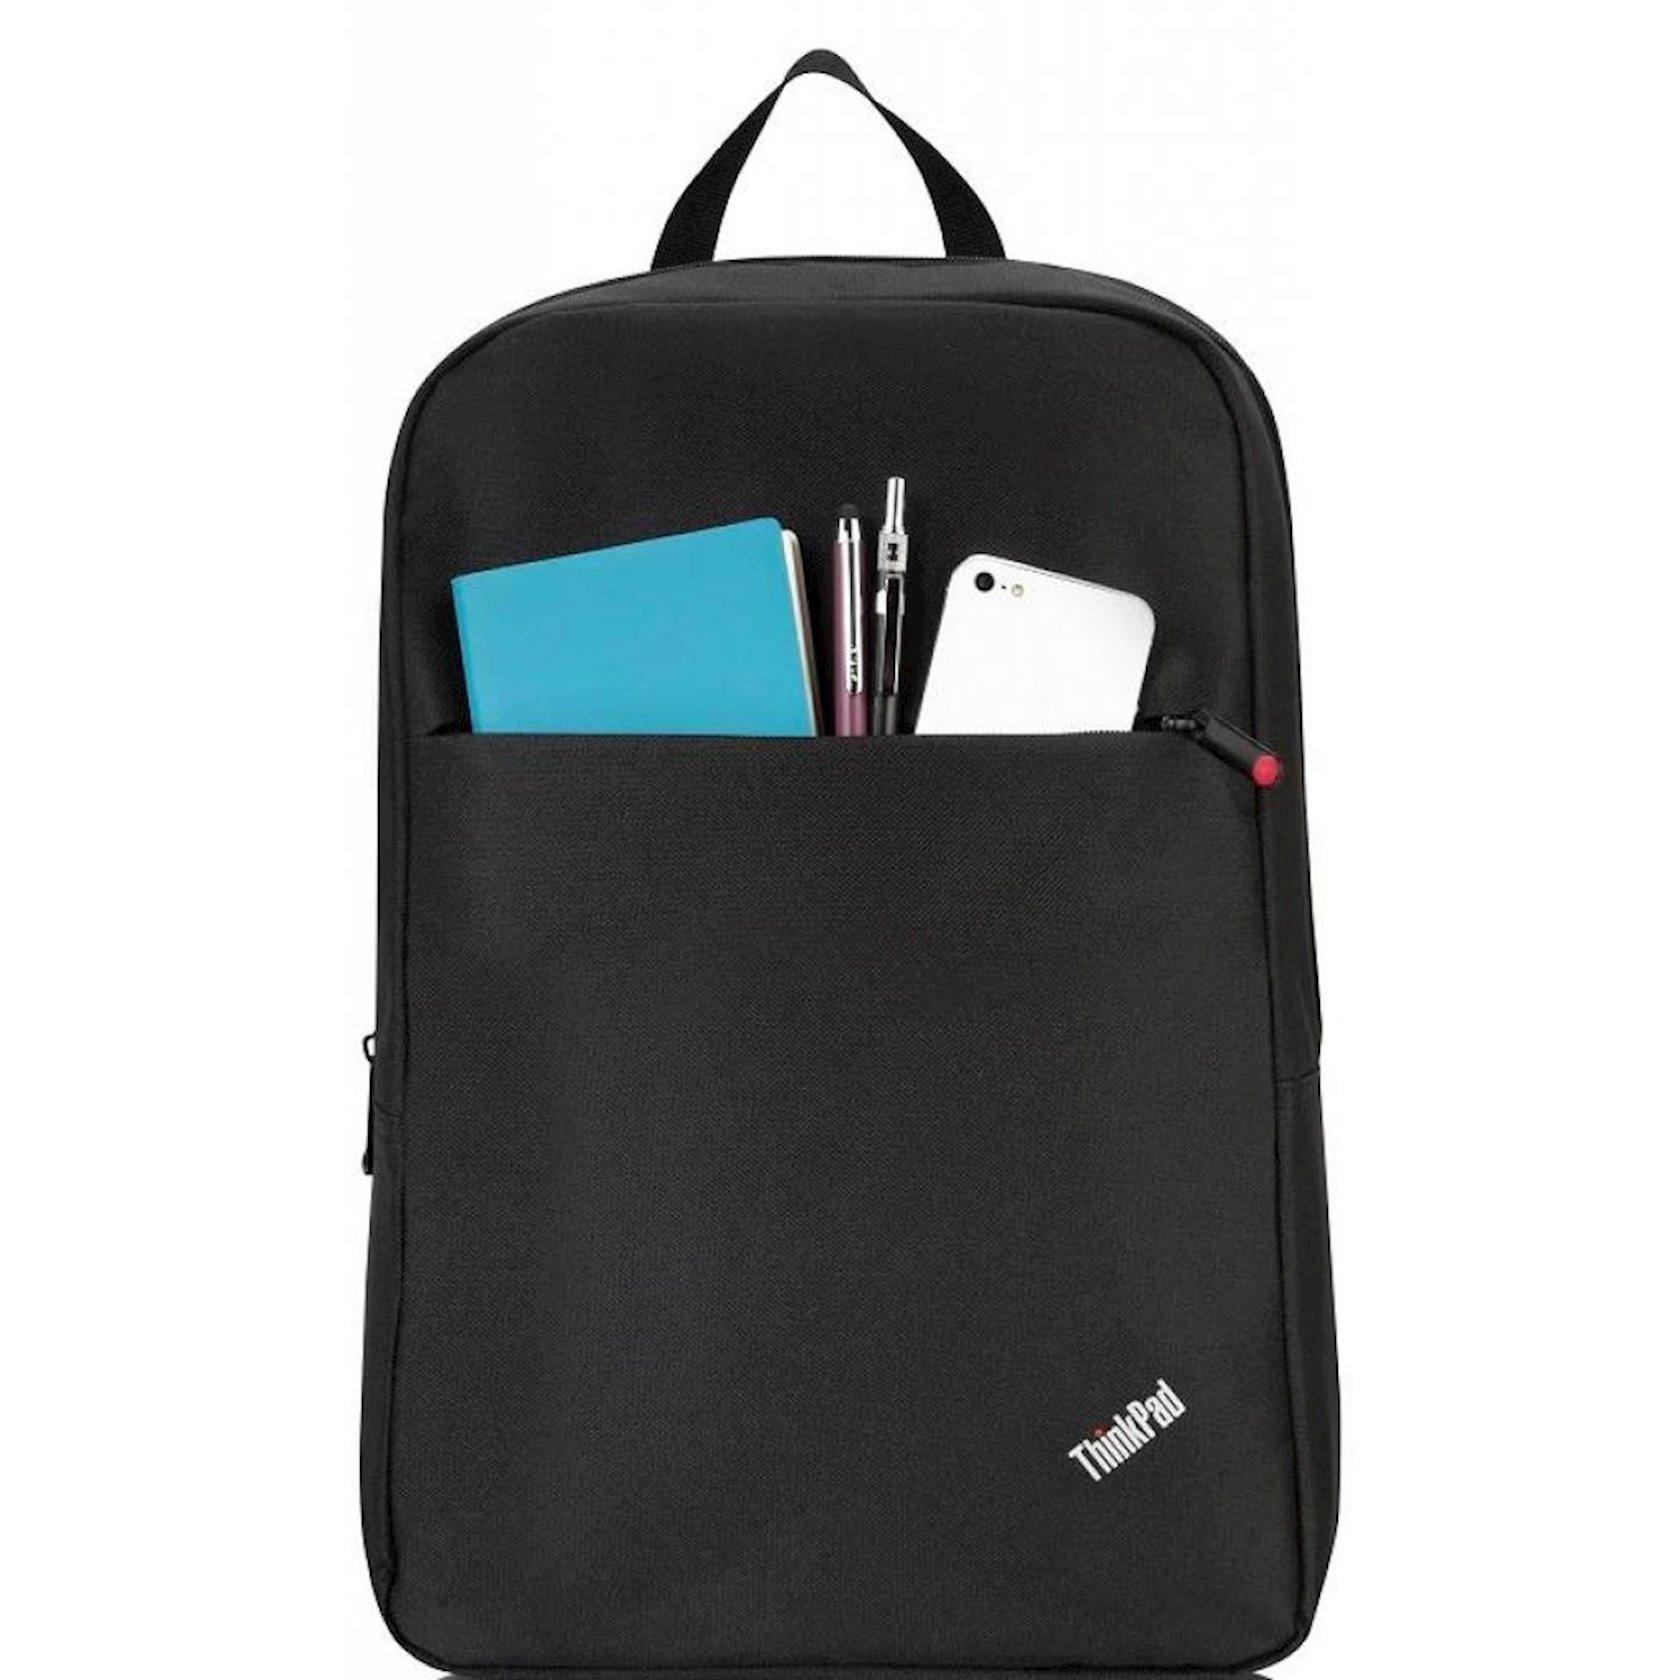 Noutbuk üçün bel çantası Lenovo 15.6 ThinkPad Basic Backpack 4X40K09936